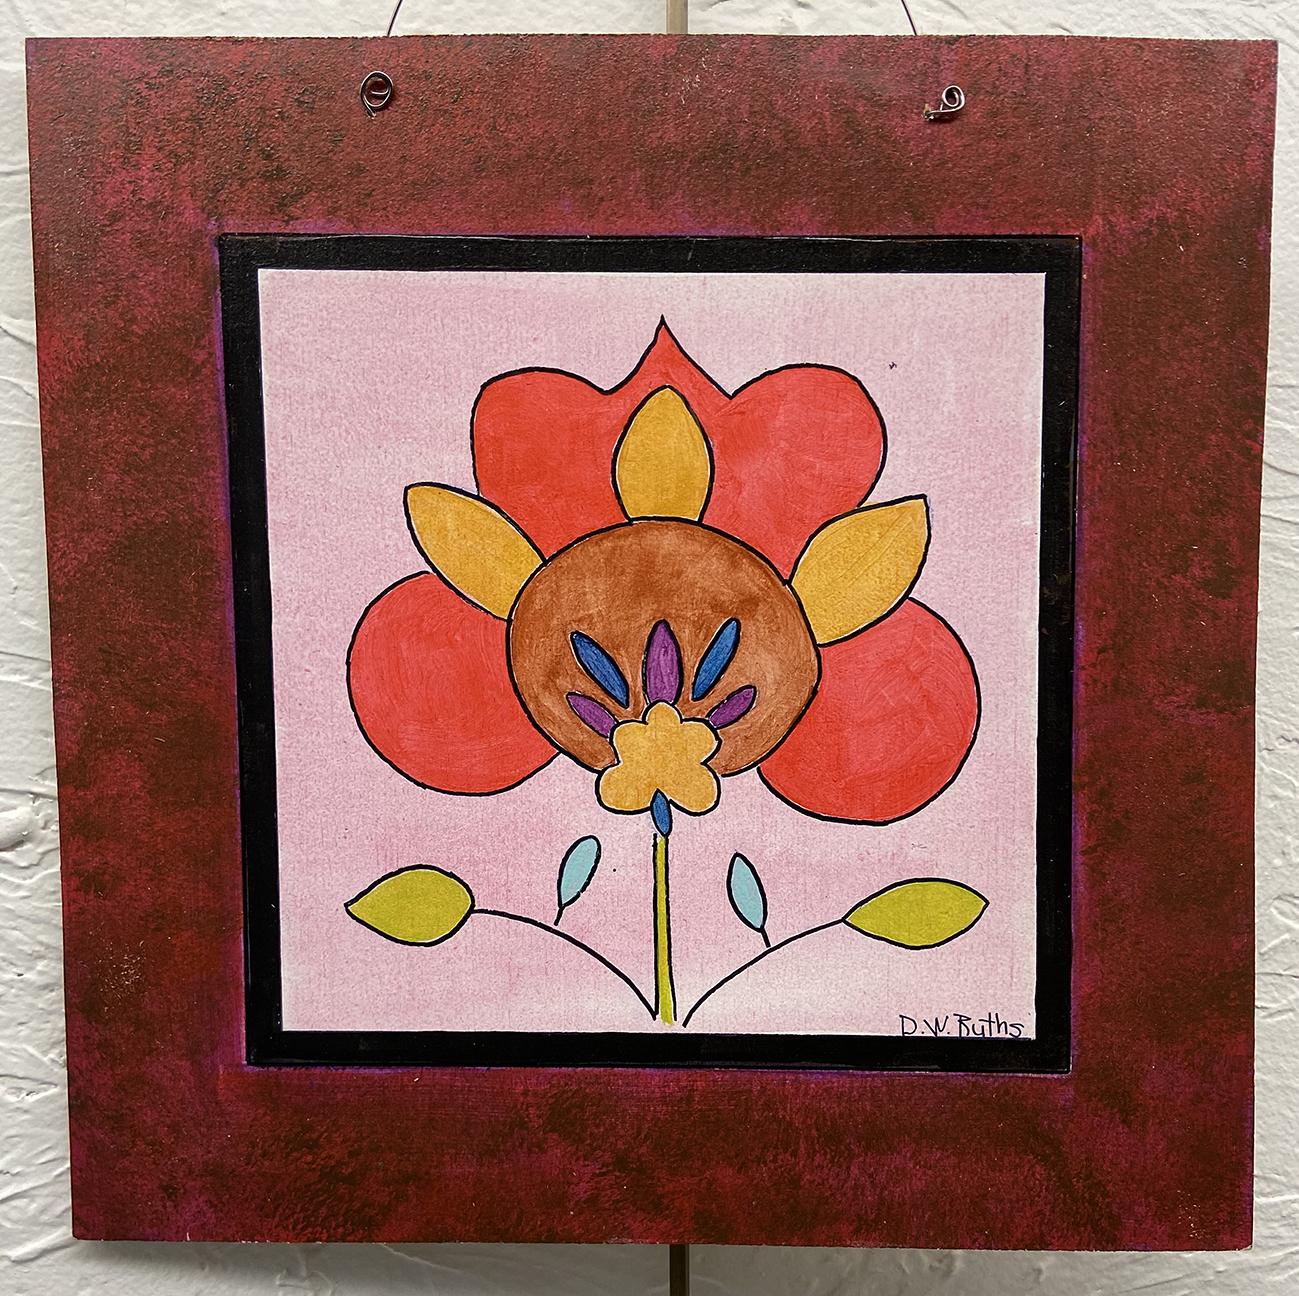 #11 Fraktur Flower, Deb Ruths, Acrylic on Wood (10 x 10), $15.00 suggested minimum bid  (47 meals)